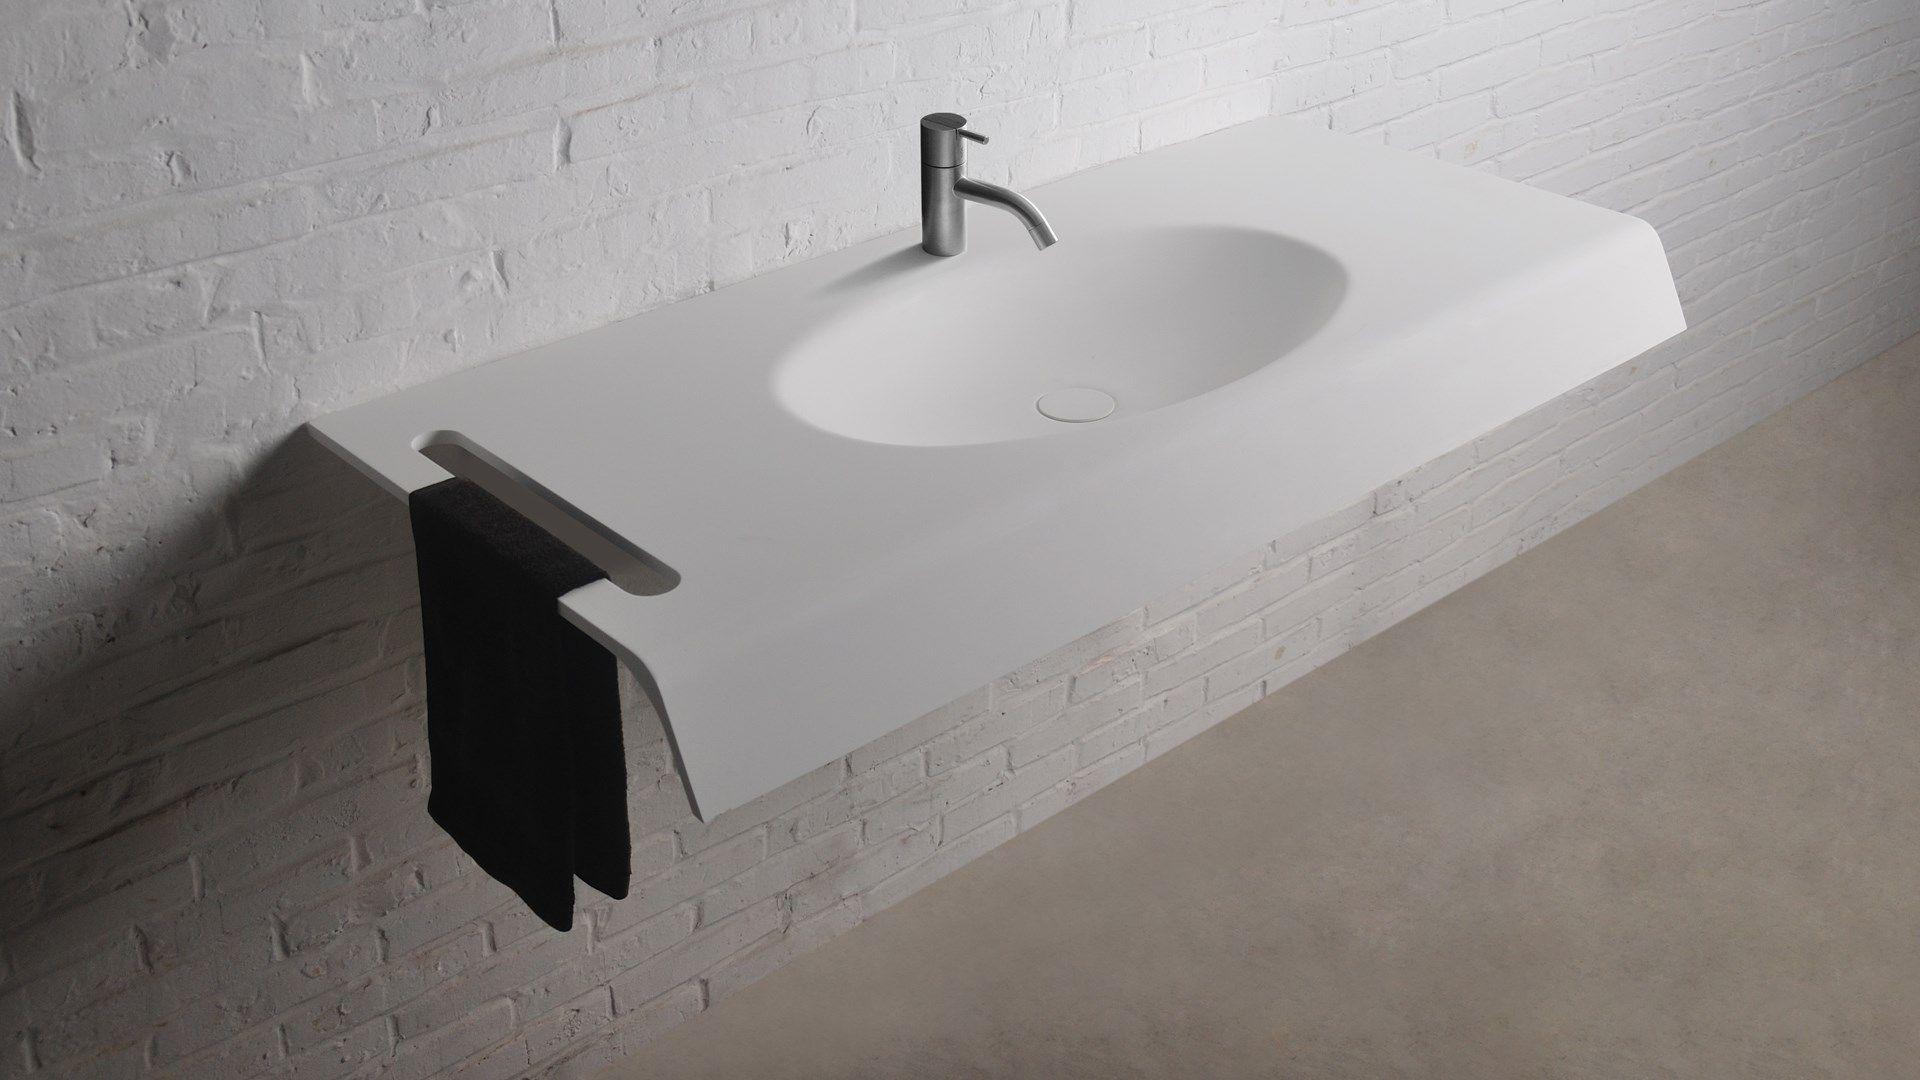 Wasbak badkamer inbouw kerra calpe inbouw wastafel 60x48cm wit